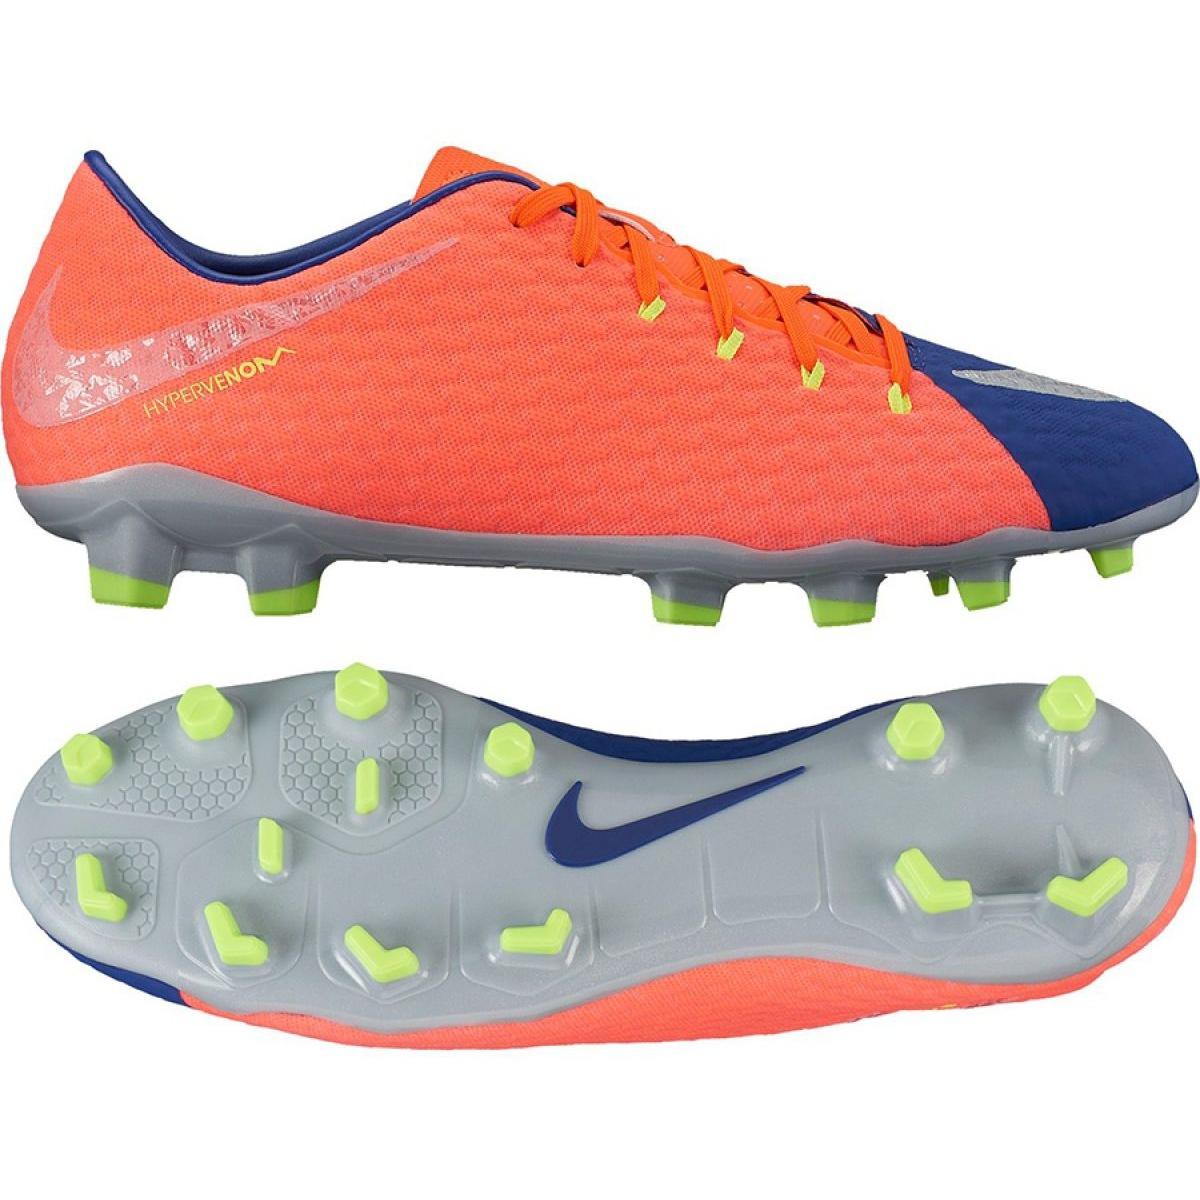 sale retailer 3e4b7 38600 Football shoes Nike Hypervenom Phelon Iii Fg M 852556-409